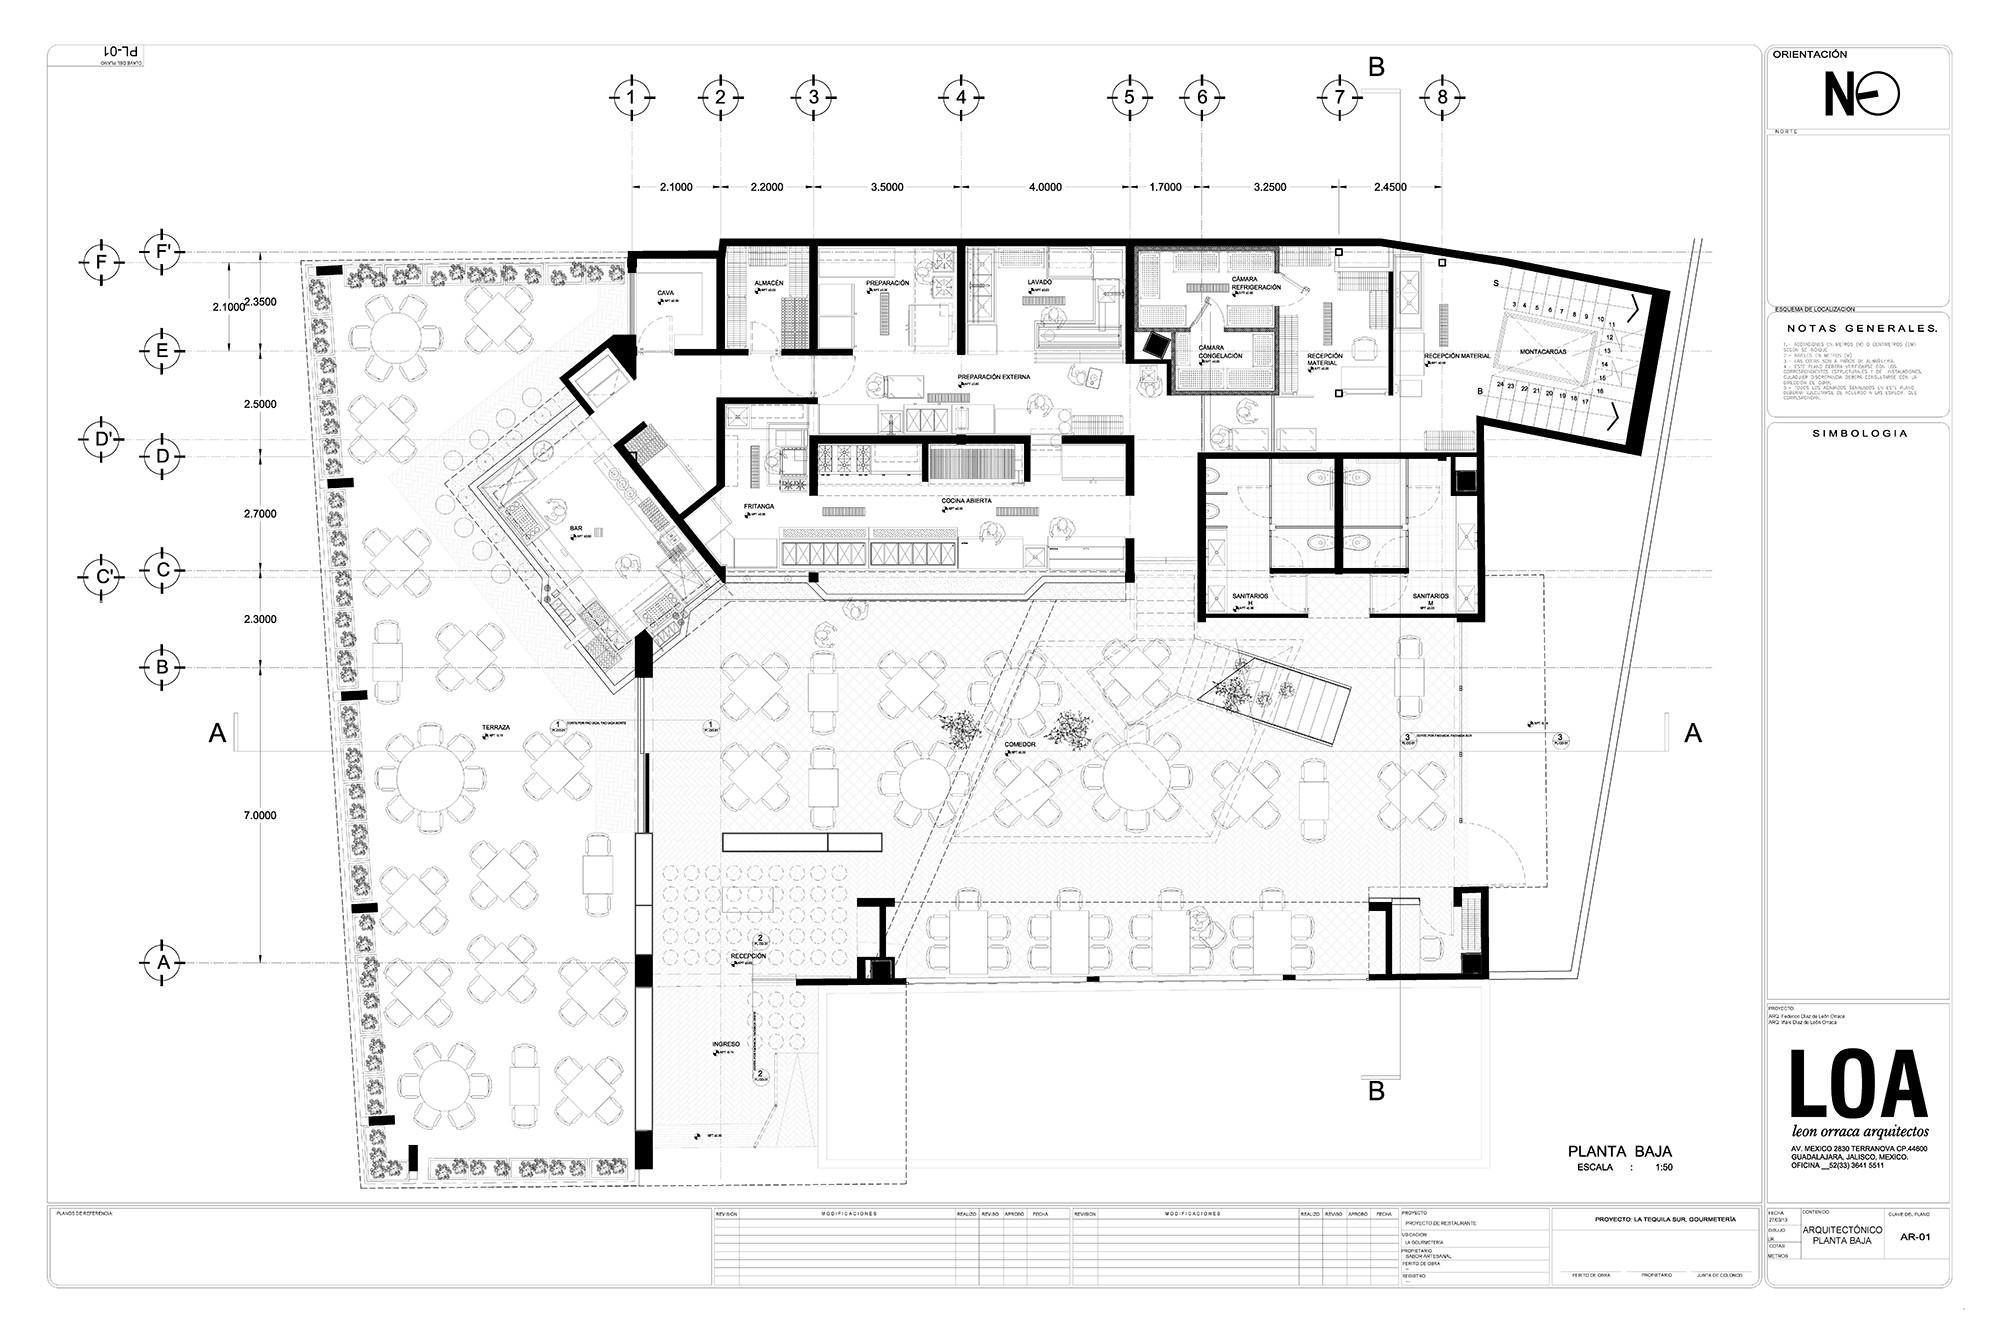 #202020 próximo projeto zaha hadid projeta hotel de luxo em macau projeto  2000x1333 px Projeto Cozinha Restaurante Dwg #2679 imagens